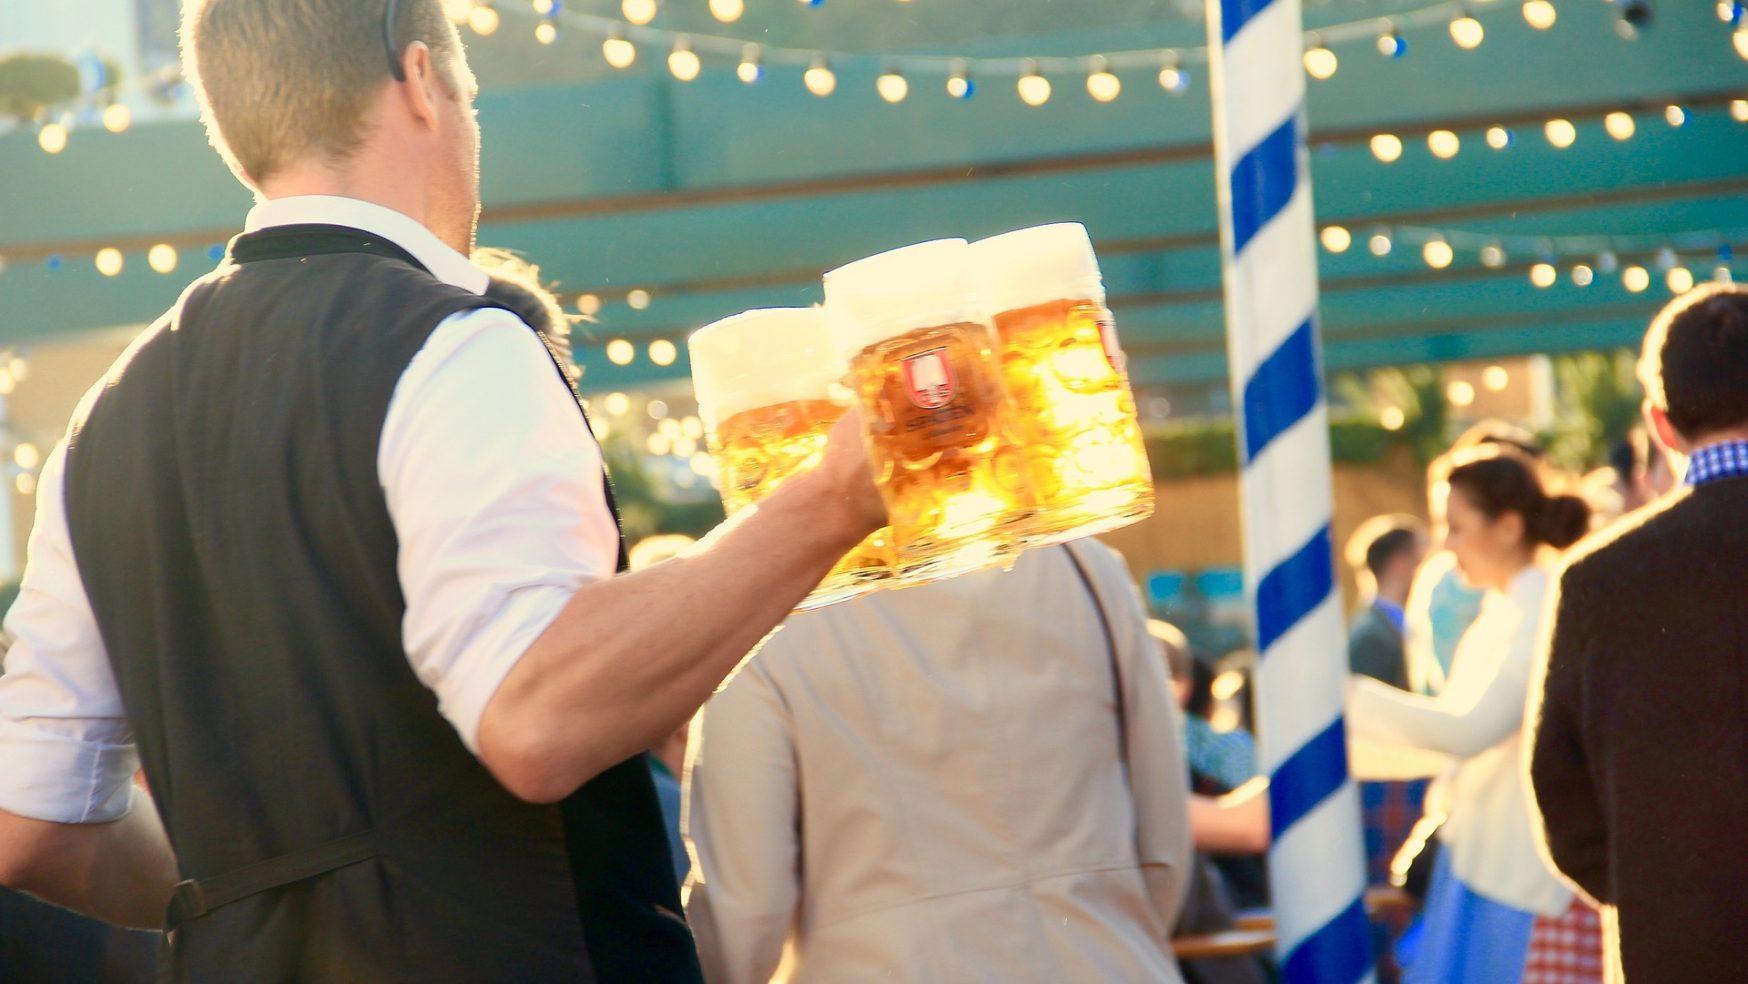 Una mañana de Oktoberfest en Munich o la historia de un gironí desubicado: